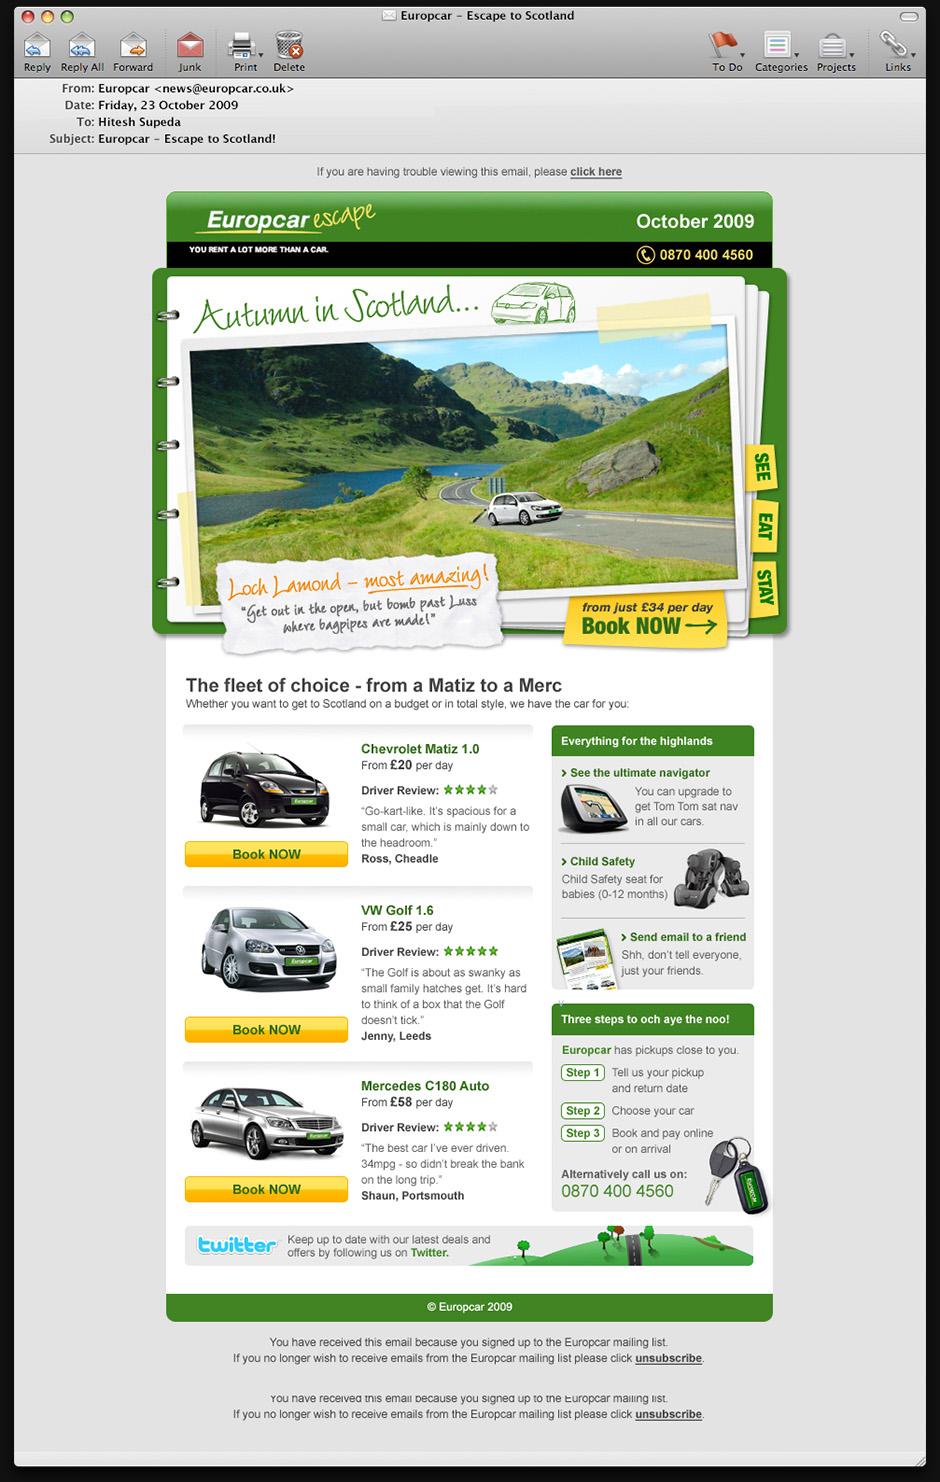 Europcar email